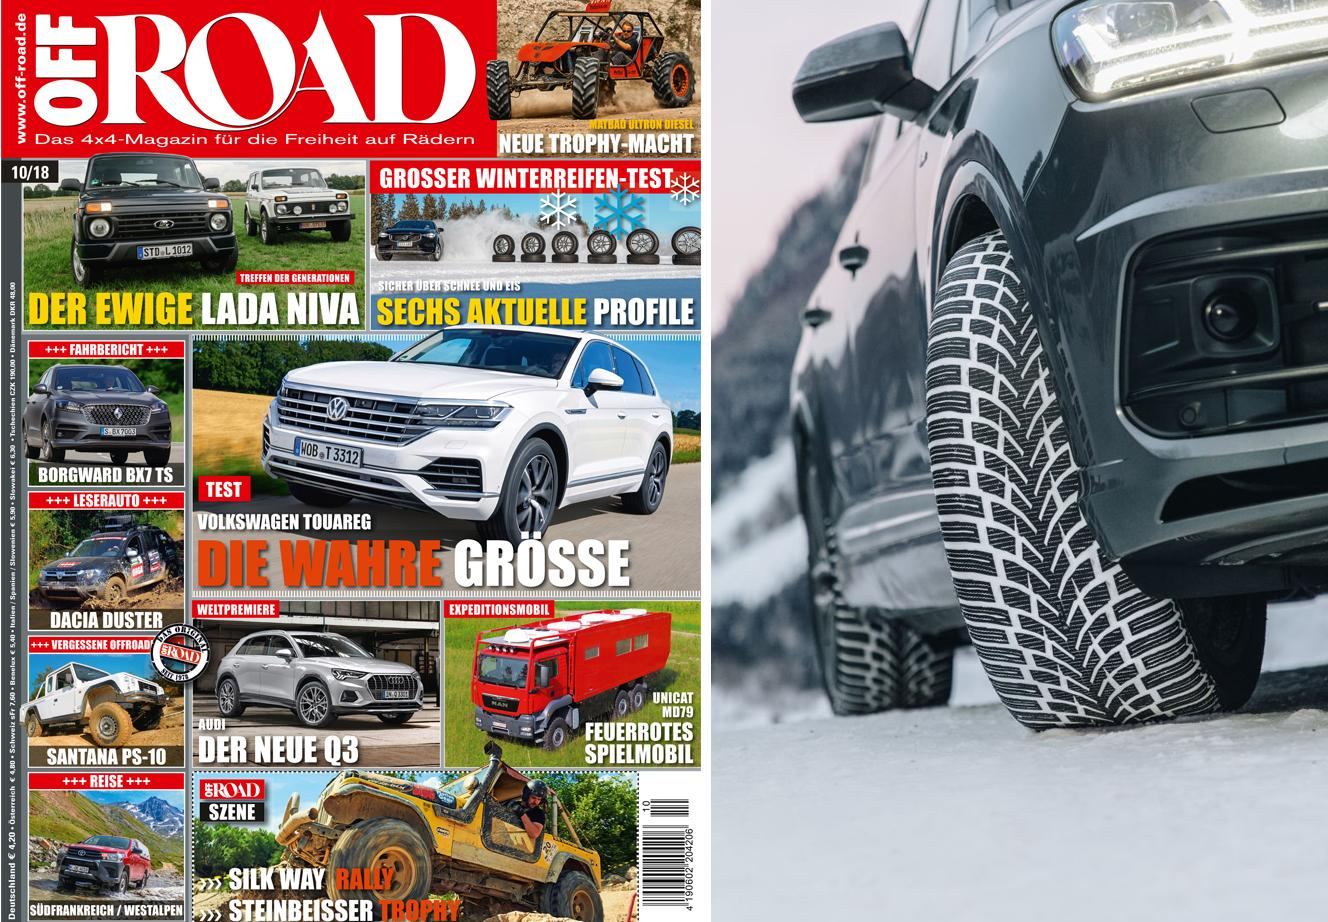 Победа Nokian WR SUV 4 в тестах журнала OFF ROAD